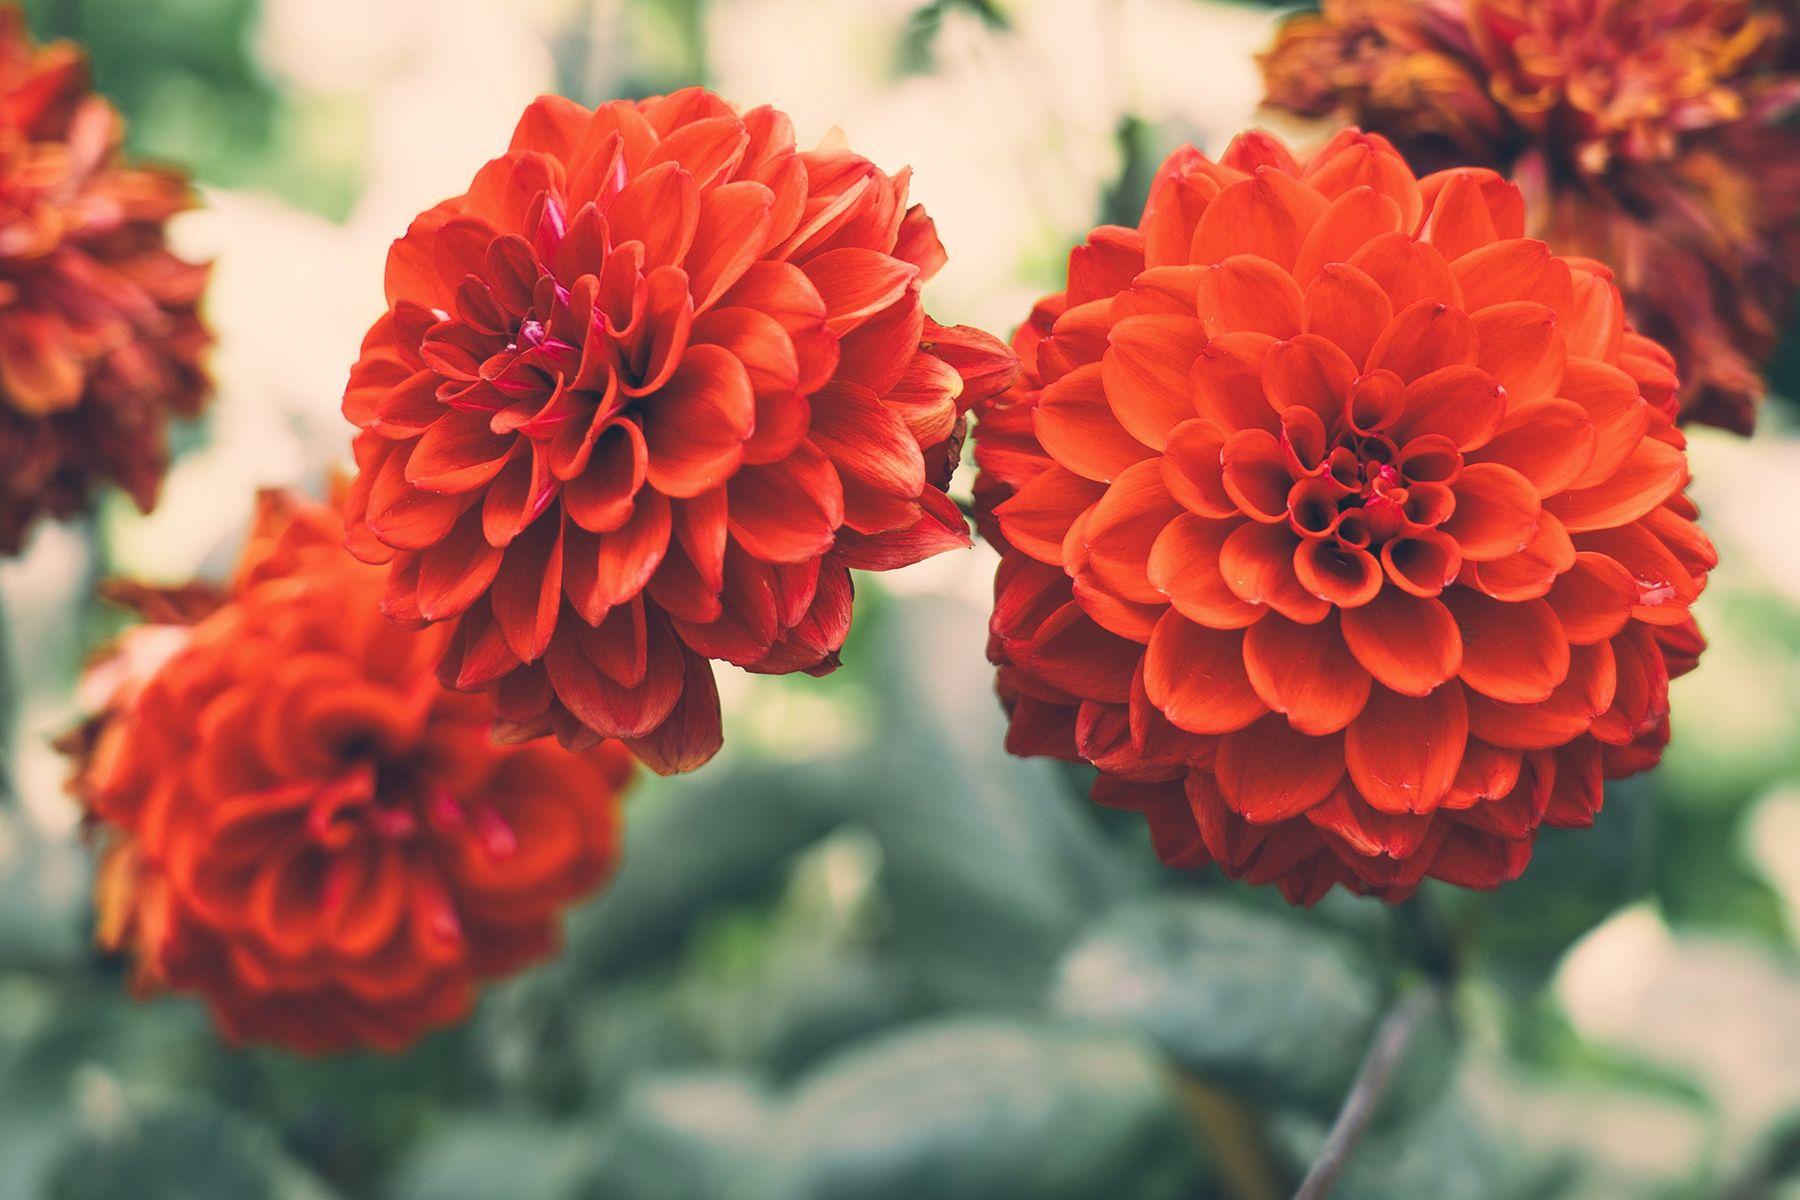 Dahlia Flower Meaning Avas flowers, Flower meanings